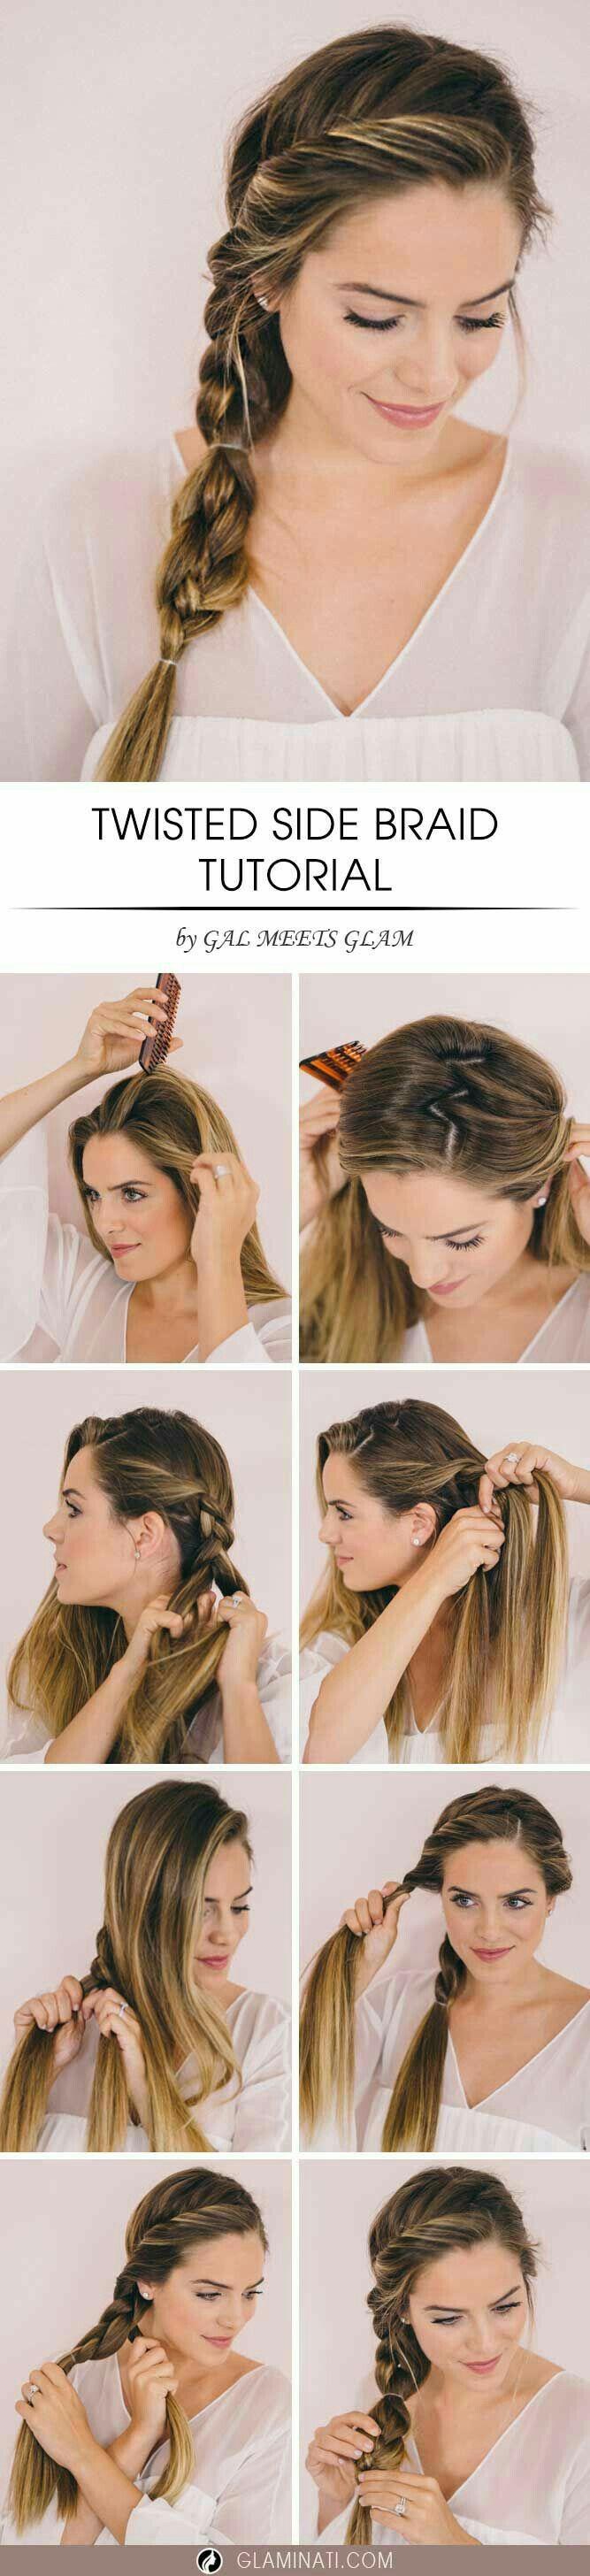 389 best Hair Romance Tutorials images on Pinterest